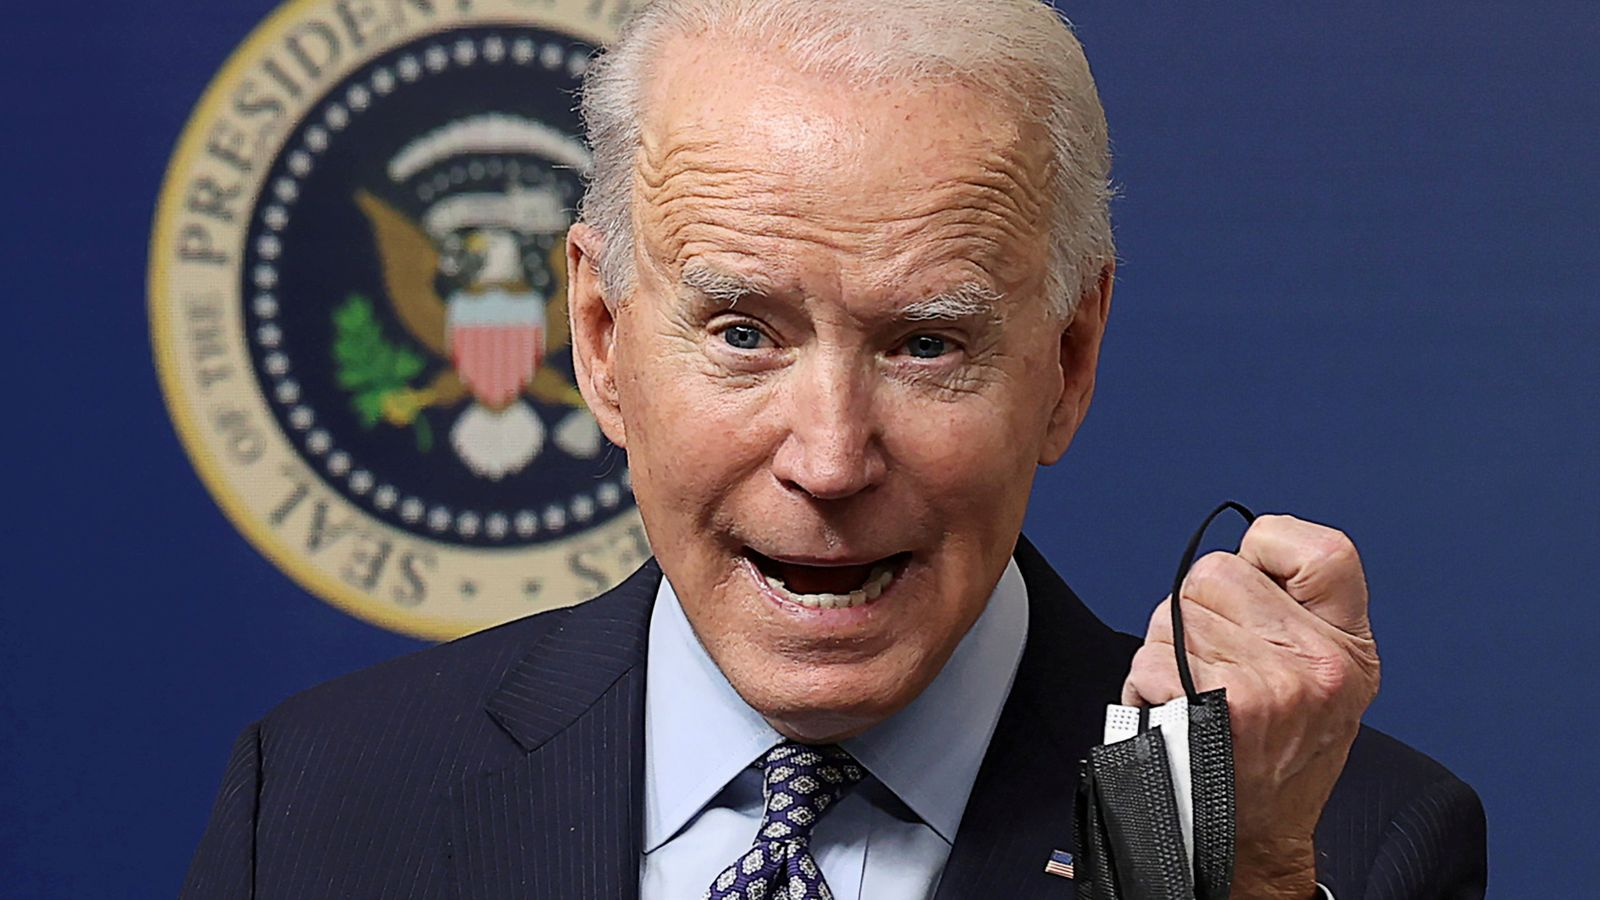 Jangan Tantang Joe Biden, Nanti Hancur Bak Milisi Iran